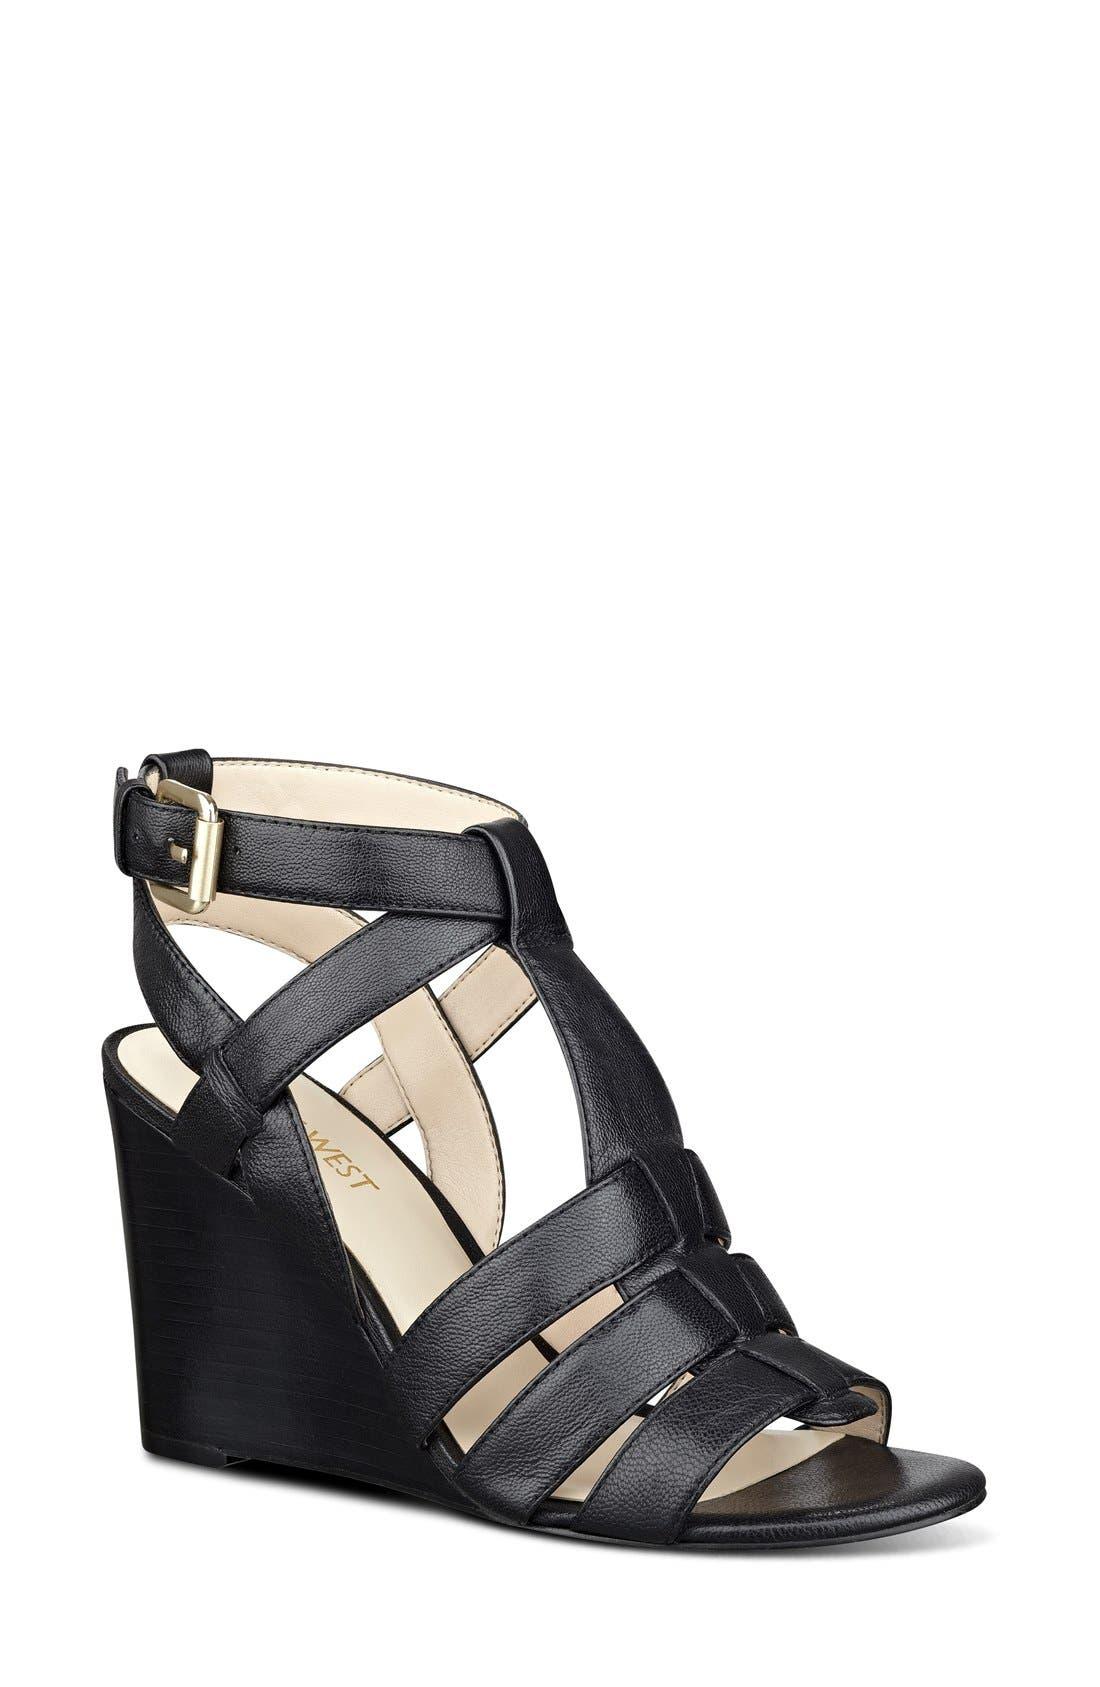 'Farfalla' Wedge Sandal, Main, color, 001